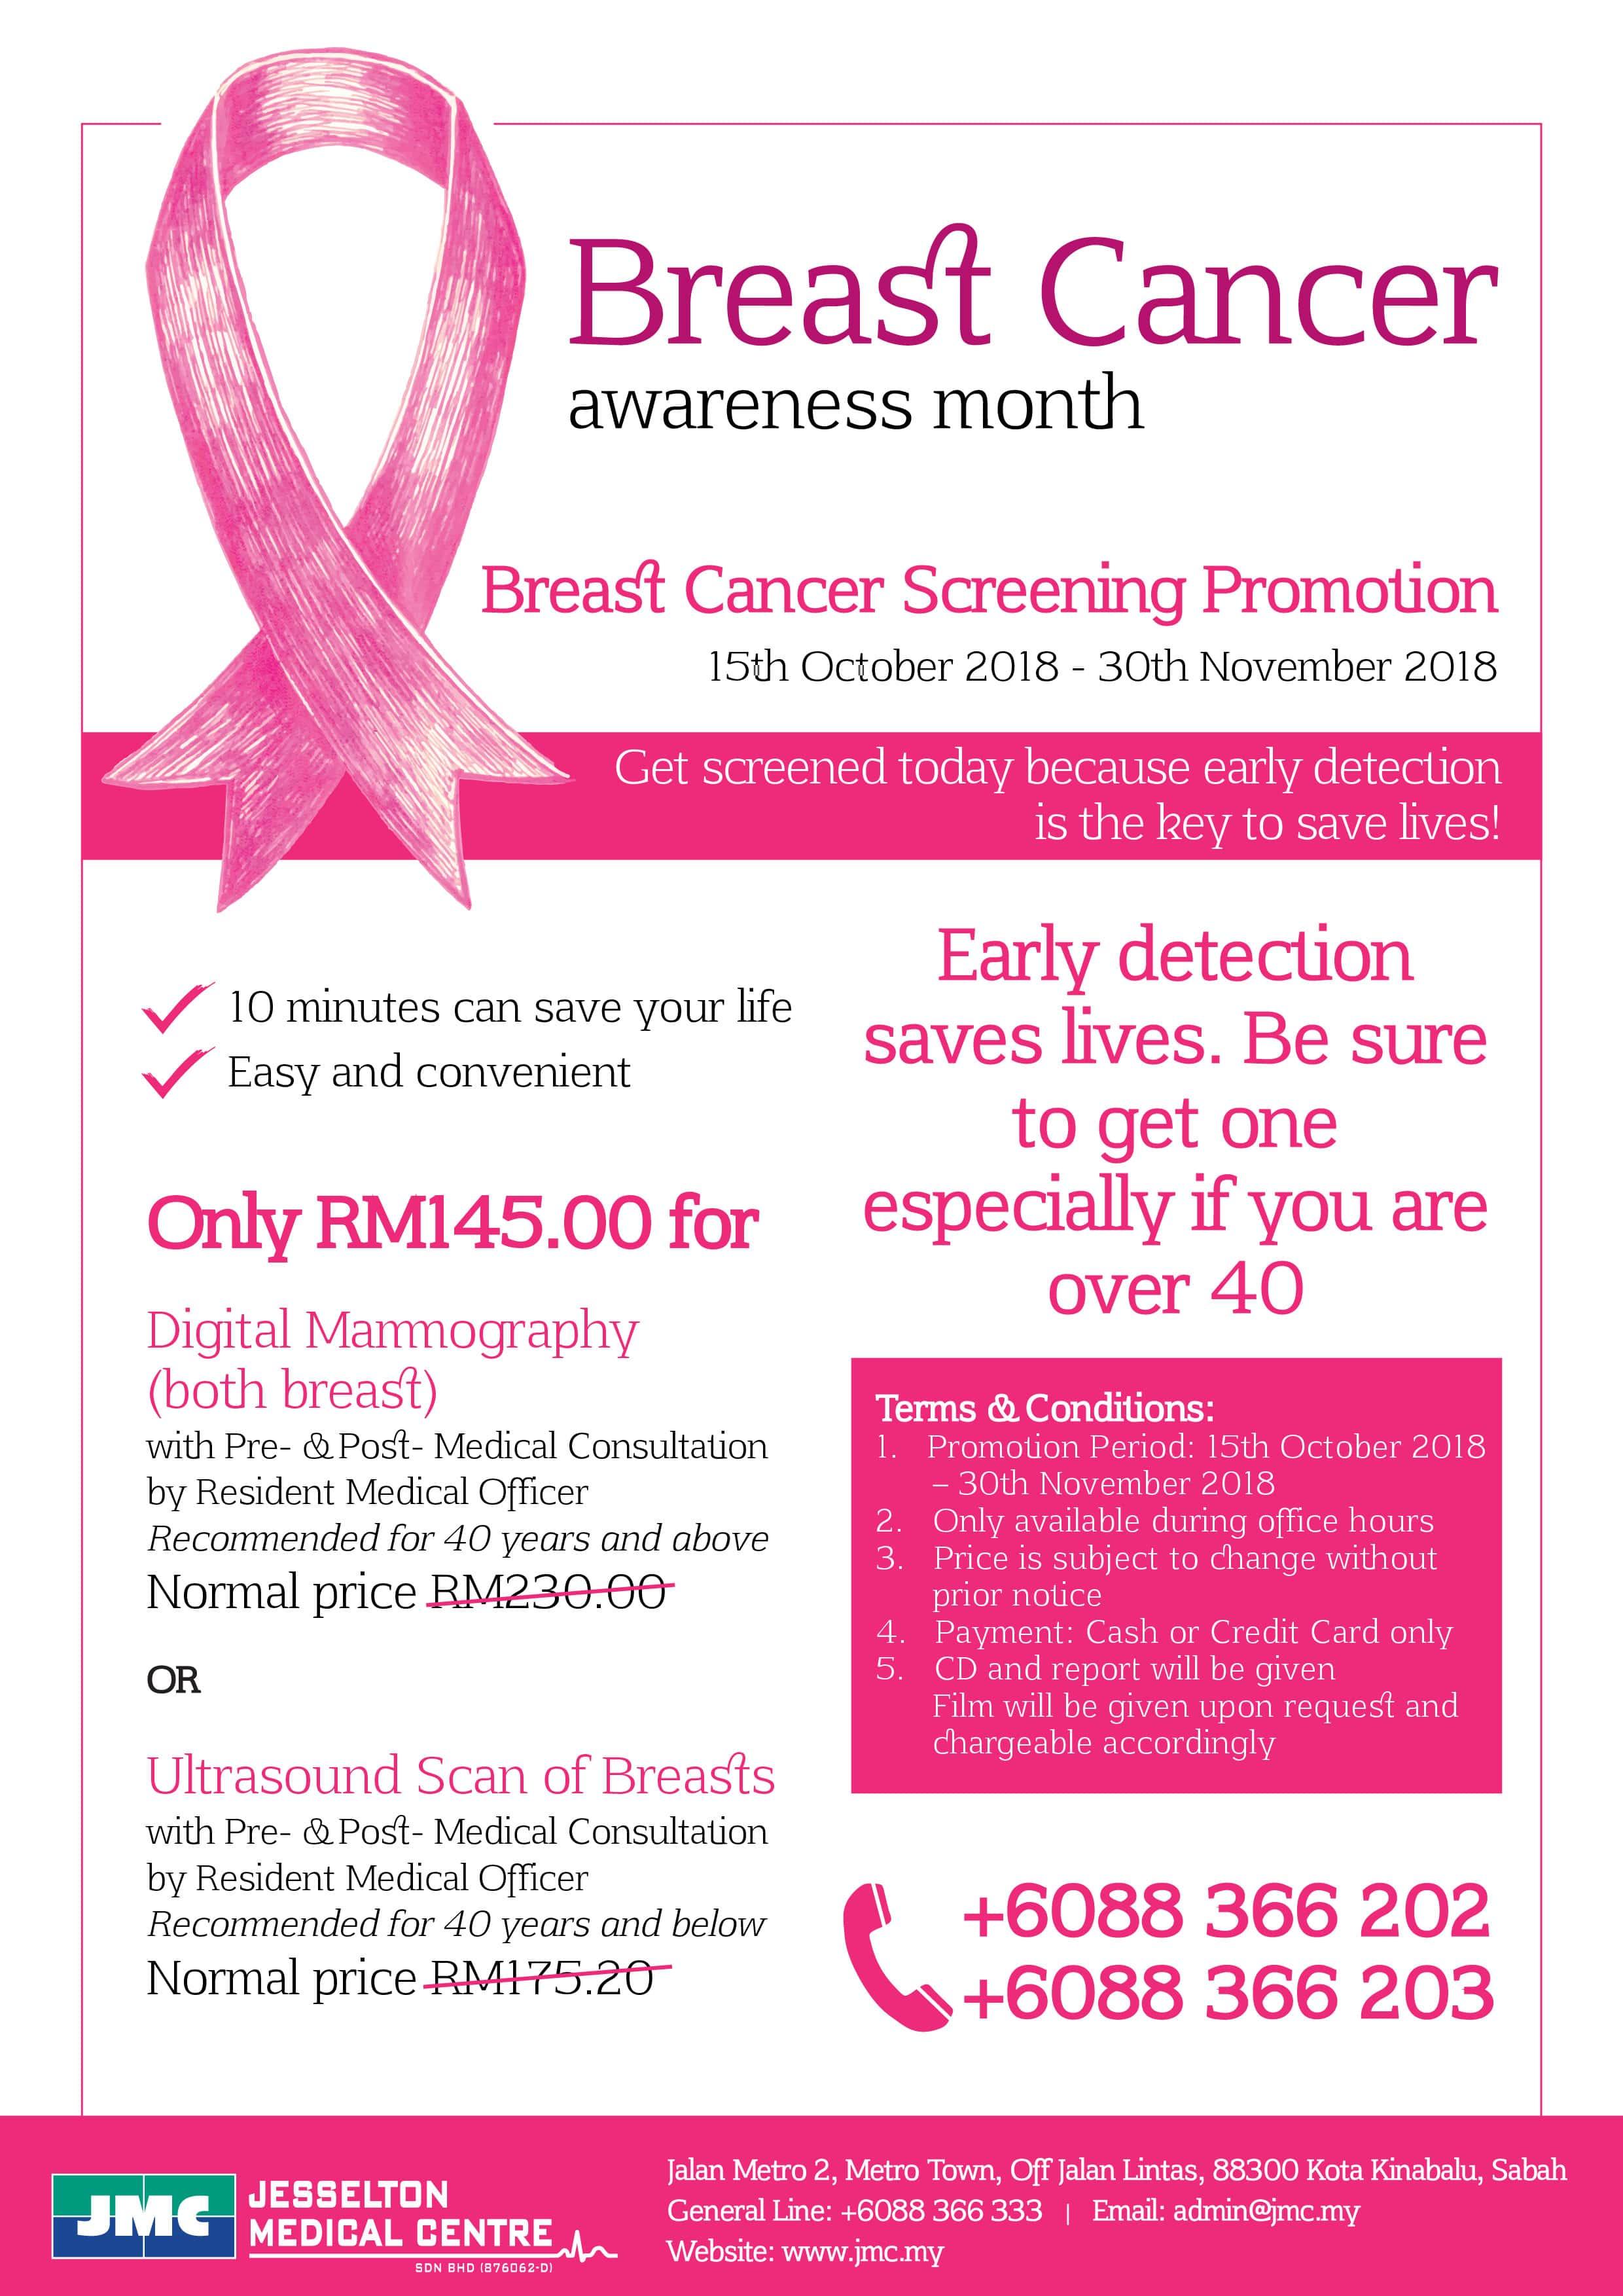 JMC_Breast_Cancer_Awareness_2018.jpg